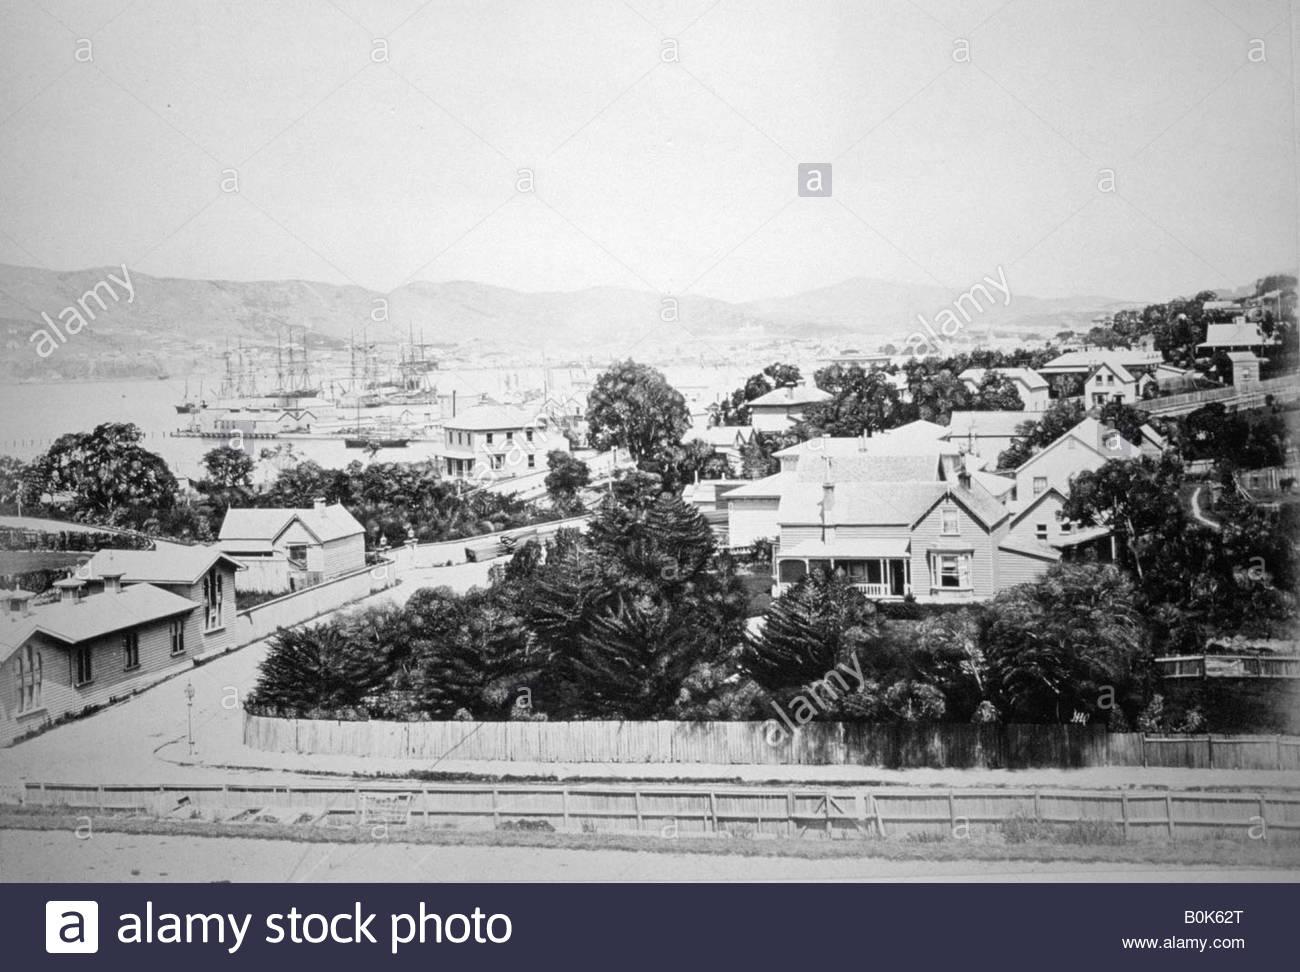 Wellington, New Zealand, 1875. Stock Photo